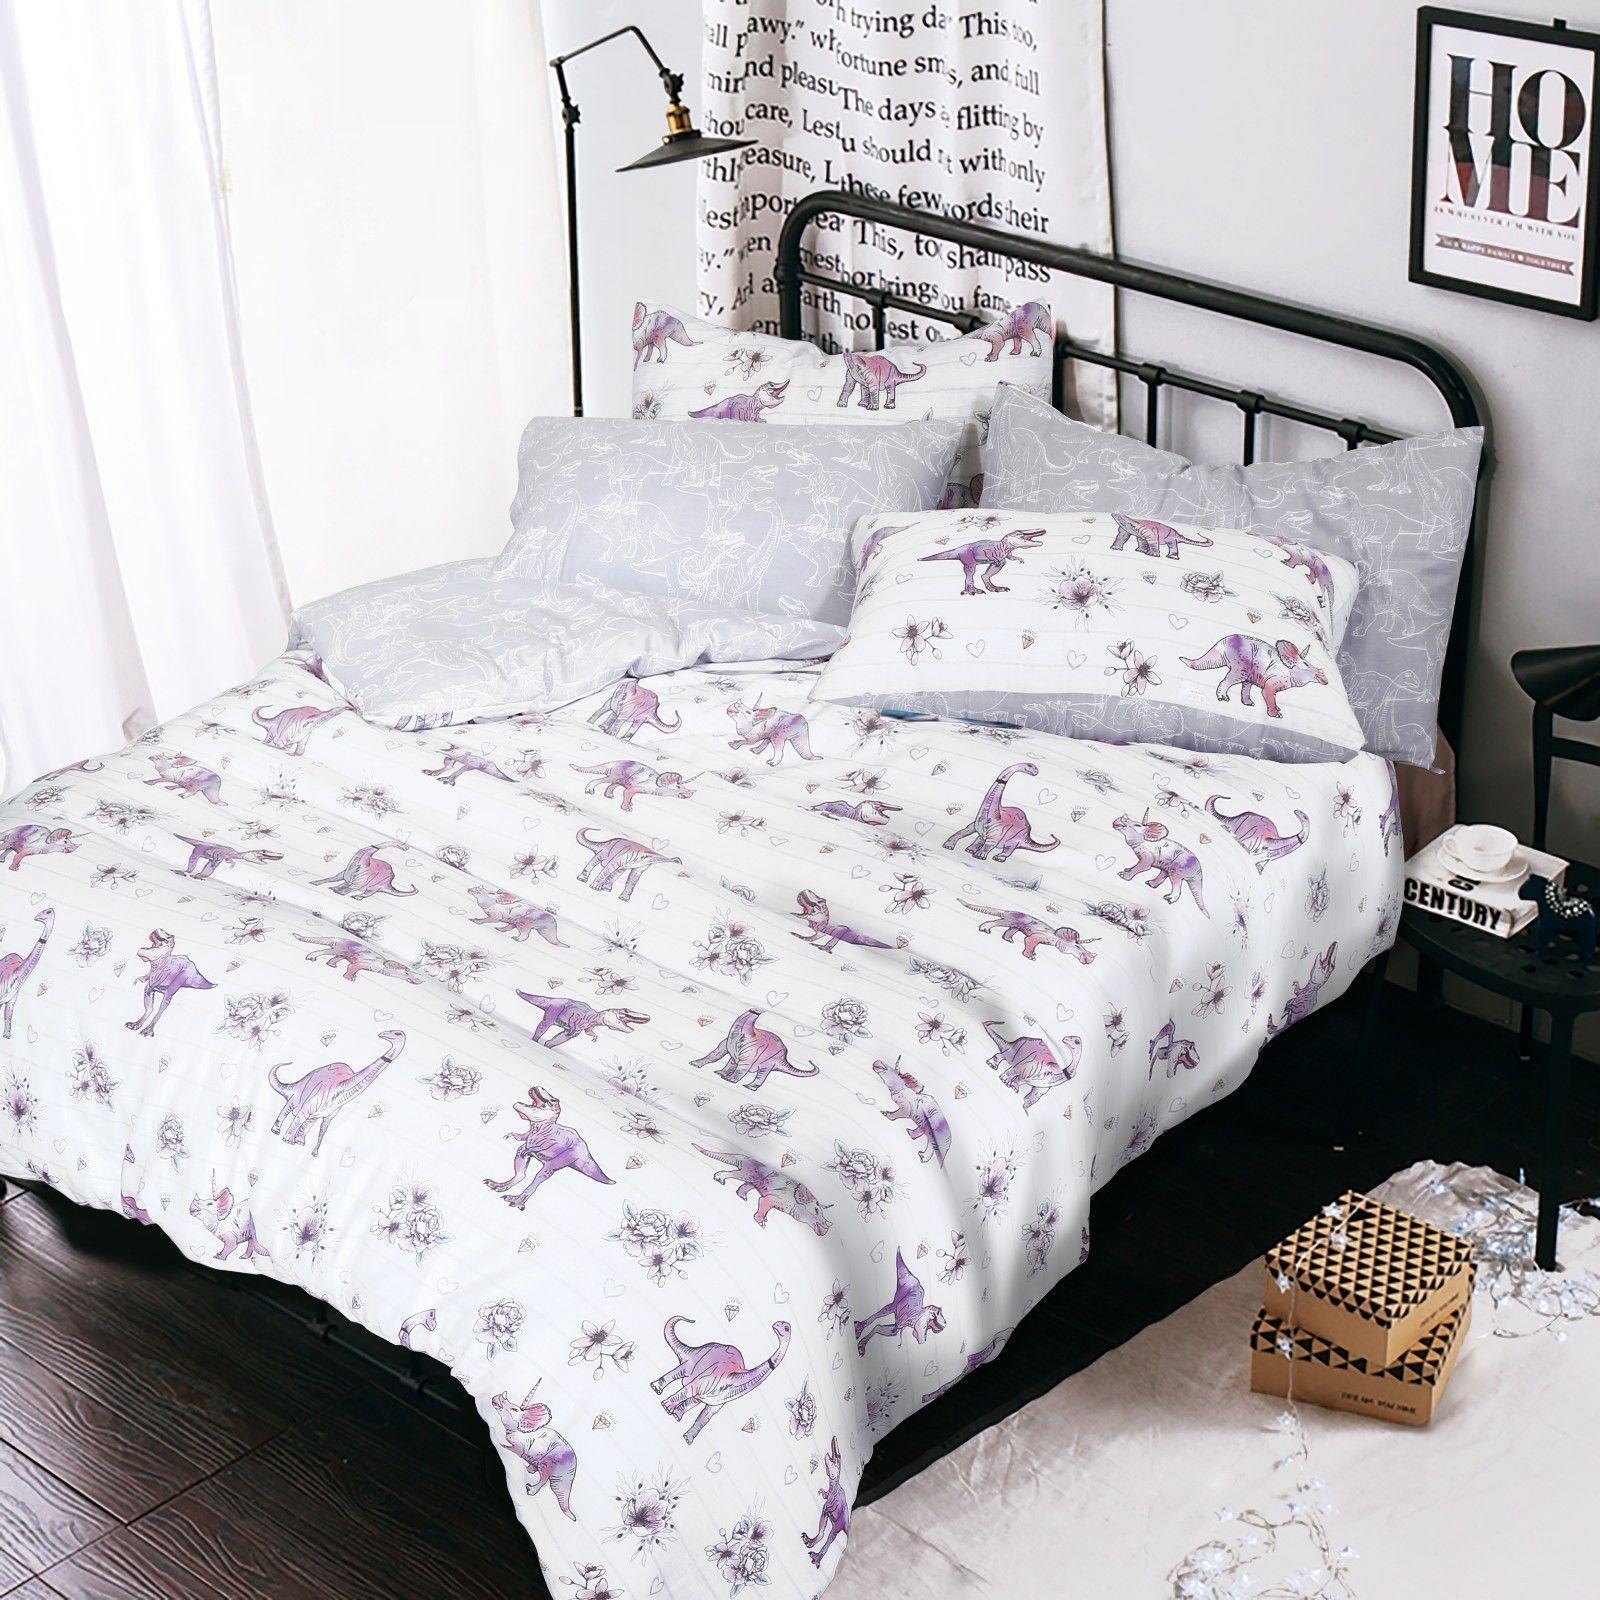 Animal-Design-Duvet-Set-Quilt-Cover-Pillowcase-Bedding-Single-Double-King-Size